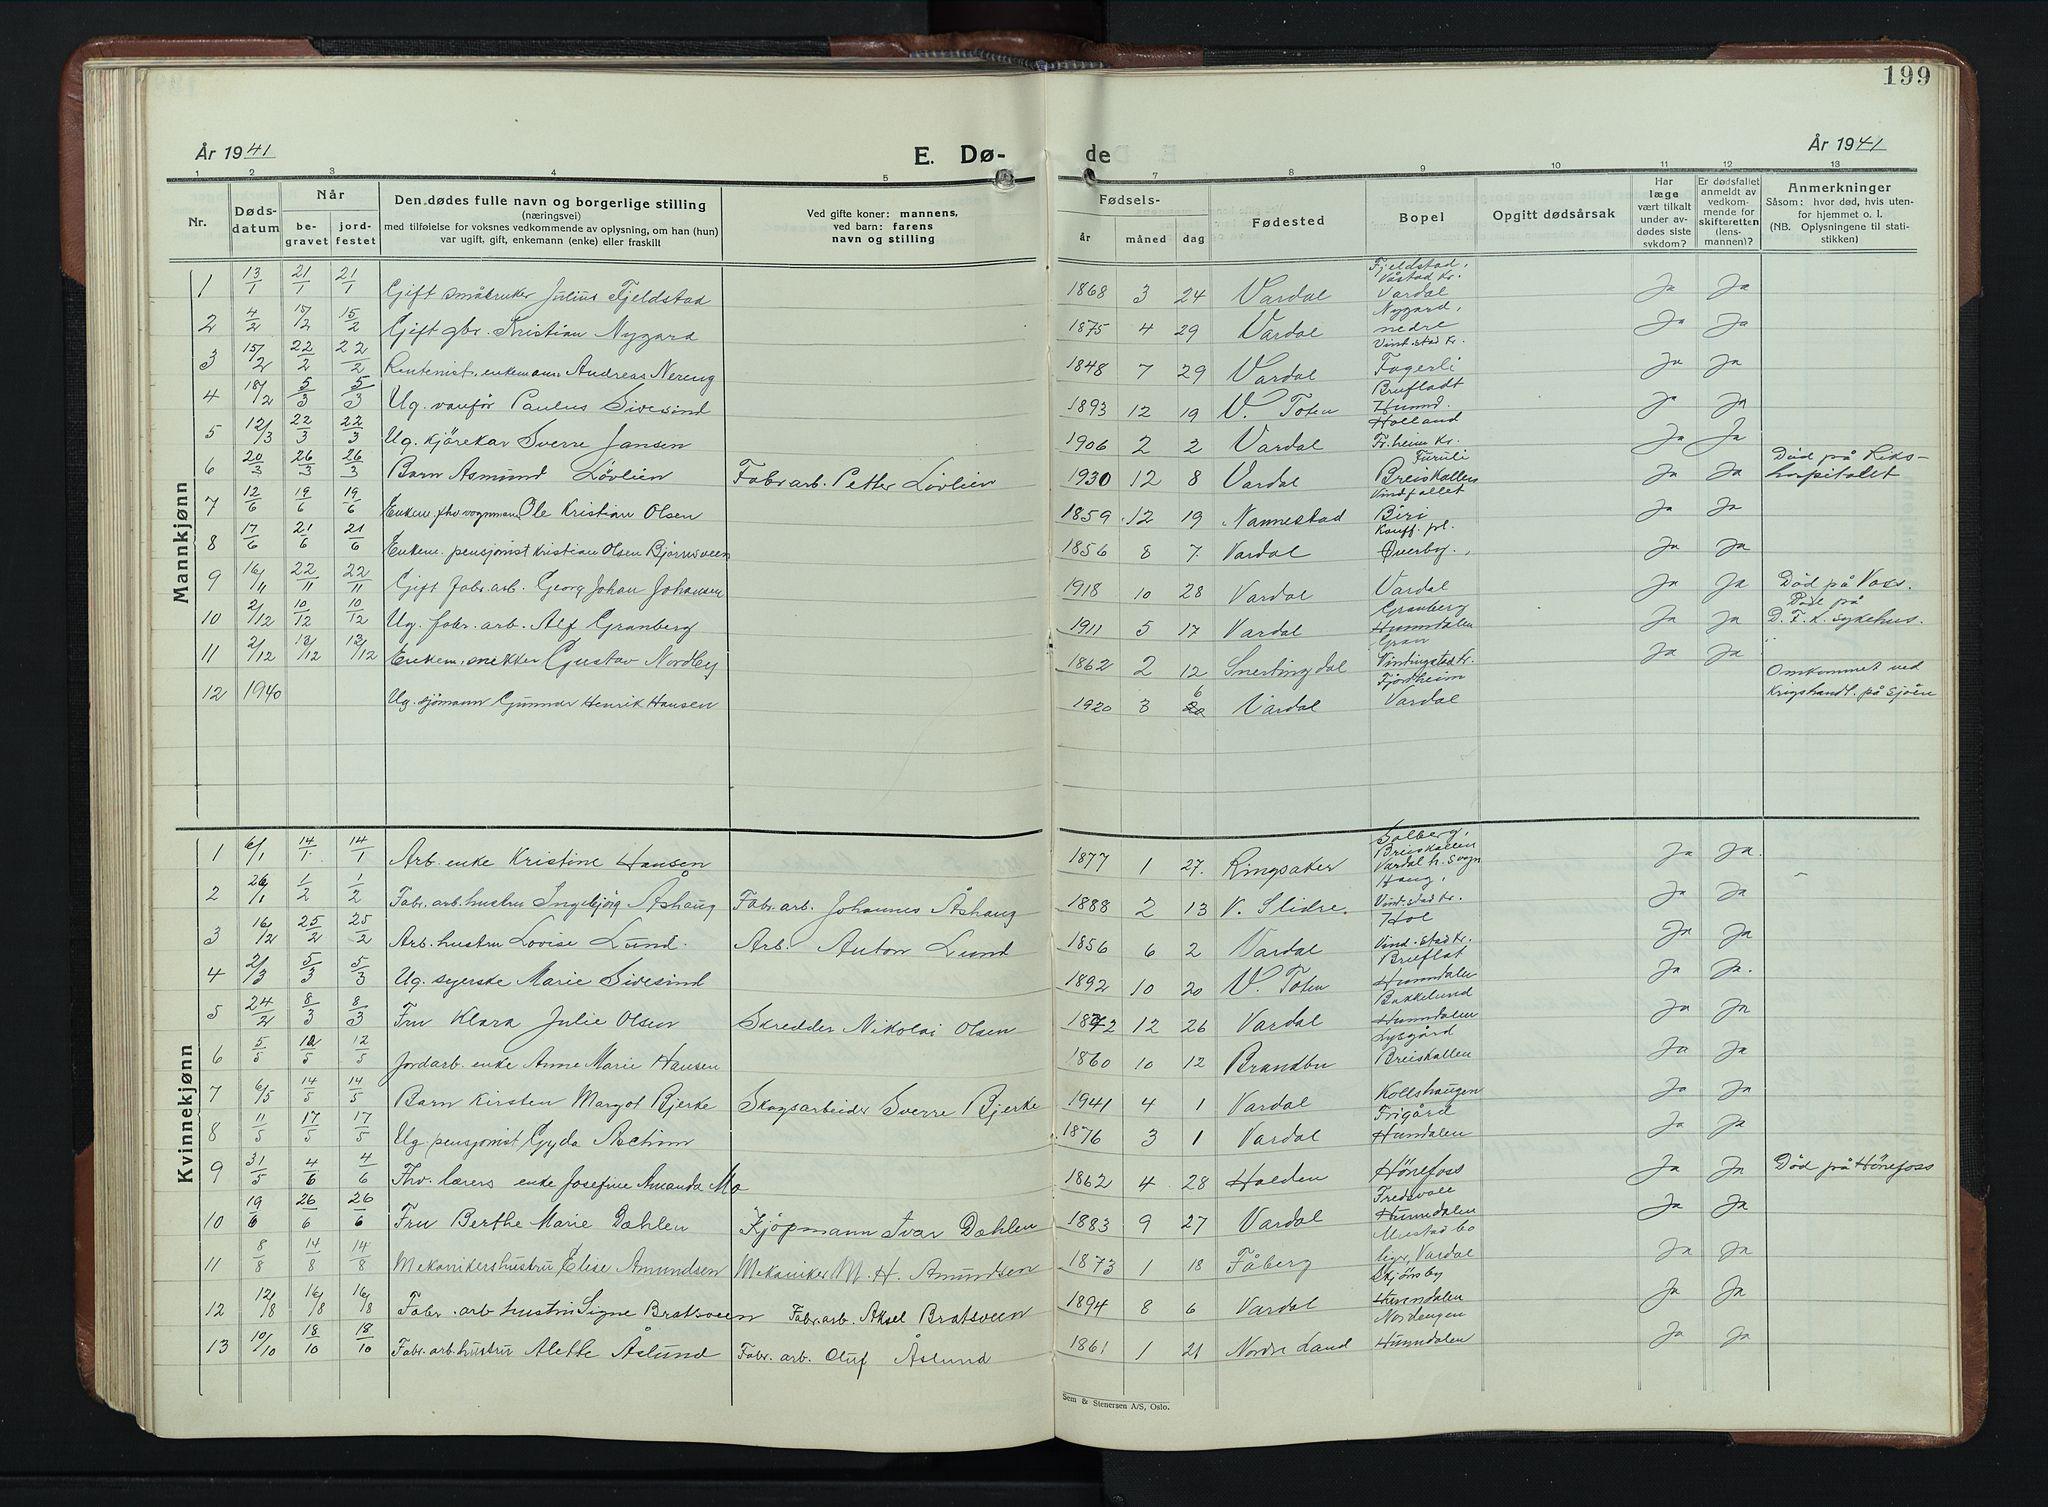 SAH, Vardal prestekontor, H/Ha/Hab/L0023: Klokkerbok nr. 23, 1929-1941, s. 199